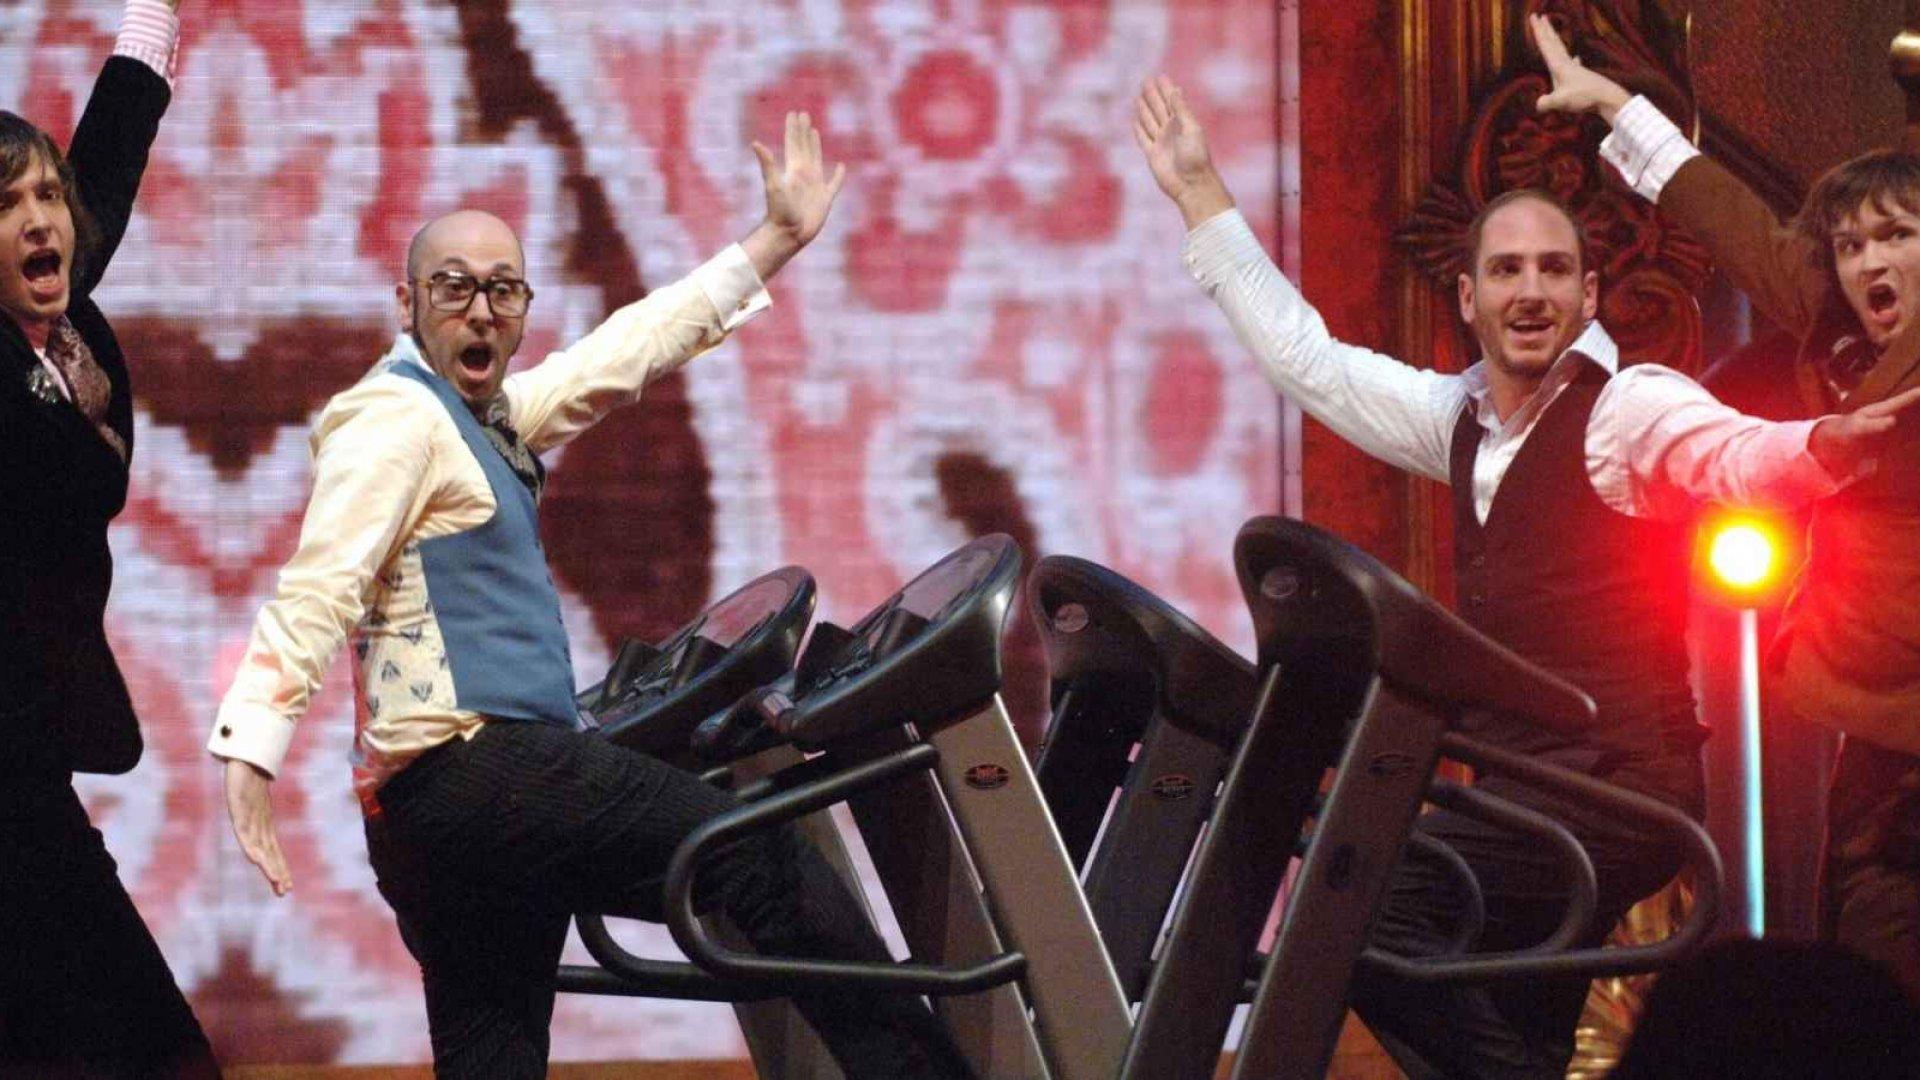 Damian Kulash (L) and OK Go performing at the MTV Video Music Awards.